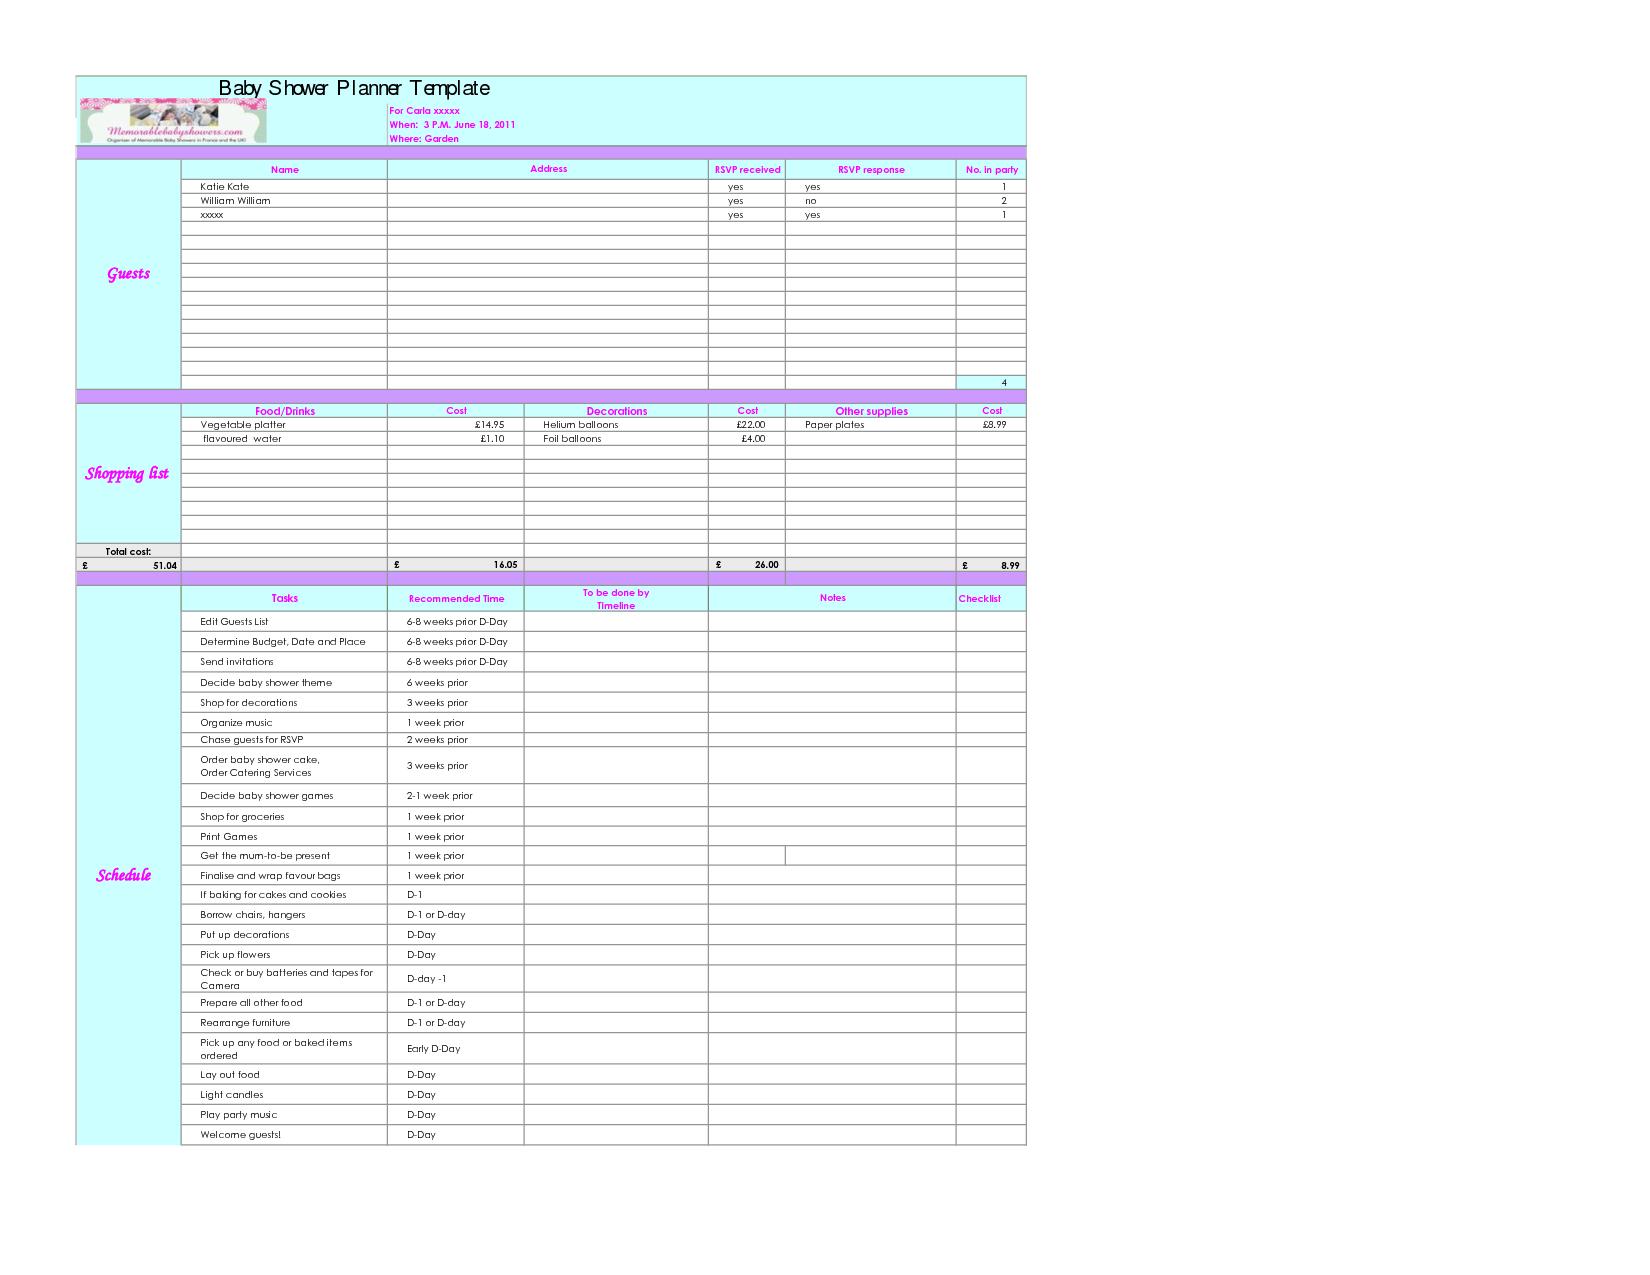 Baby Excel Spreadsheet In Example Of Baby Budget Spreadsheet Astonishing Design Shower